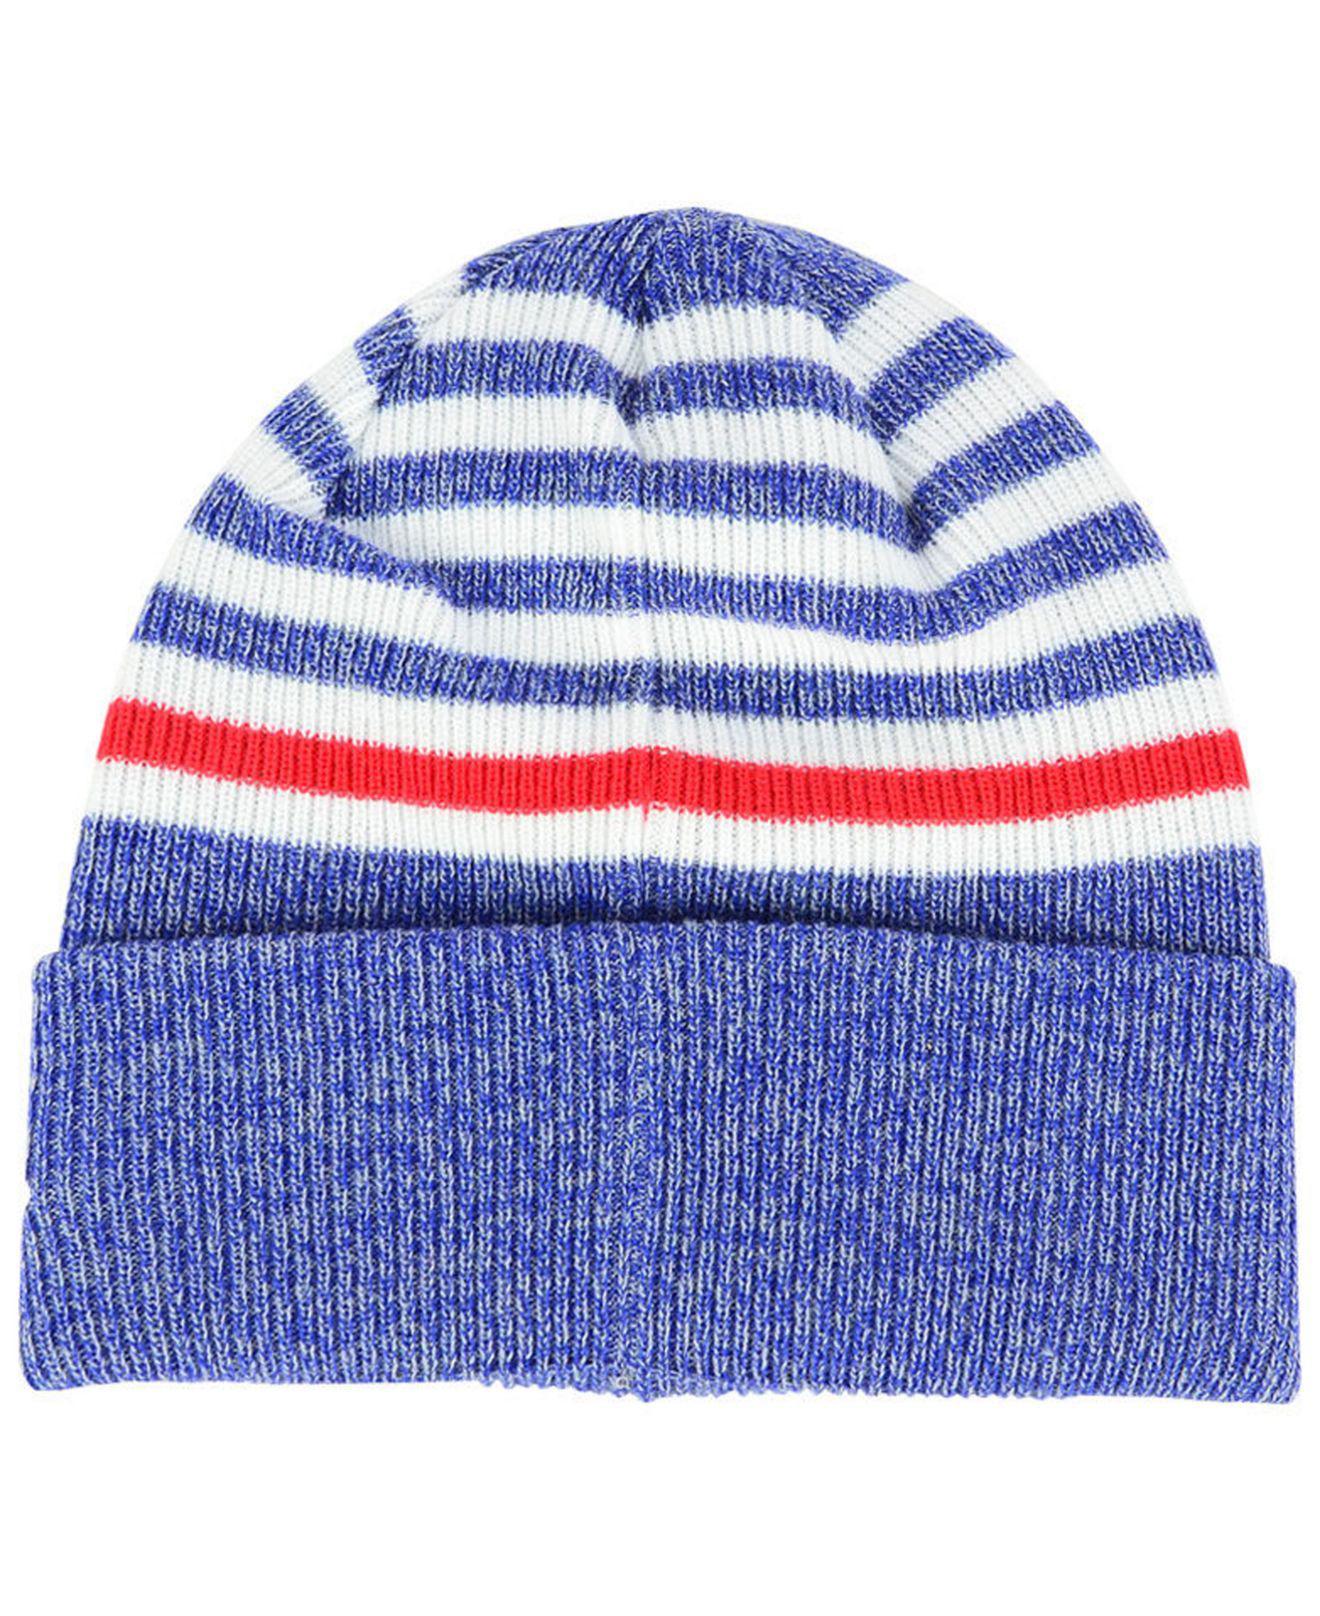 9659f9190ea ... ebay lyst ktz new york giants striped2 cuff knit hat in blue 8f173 2ed3a